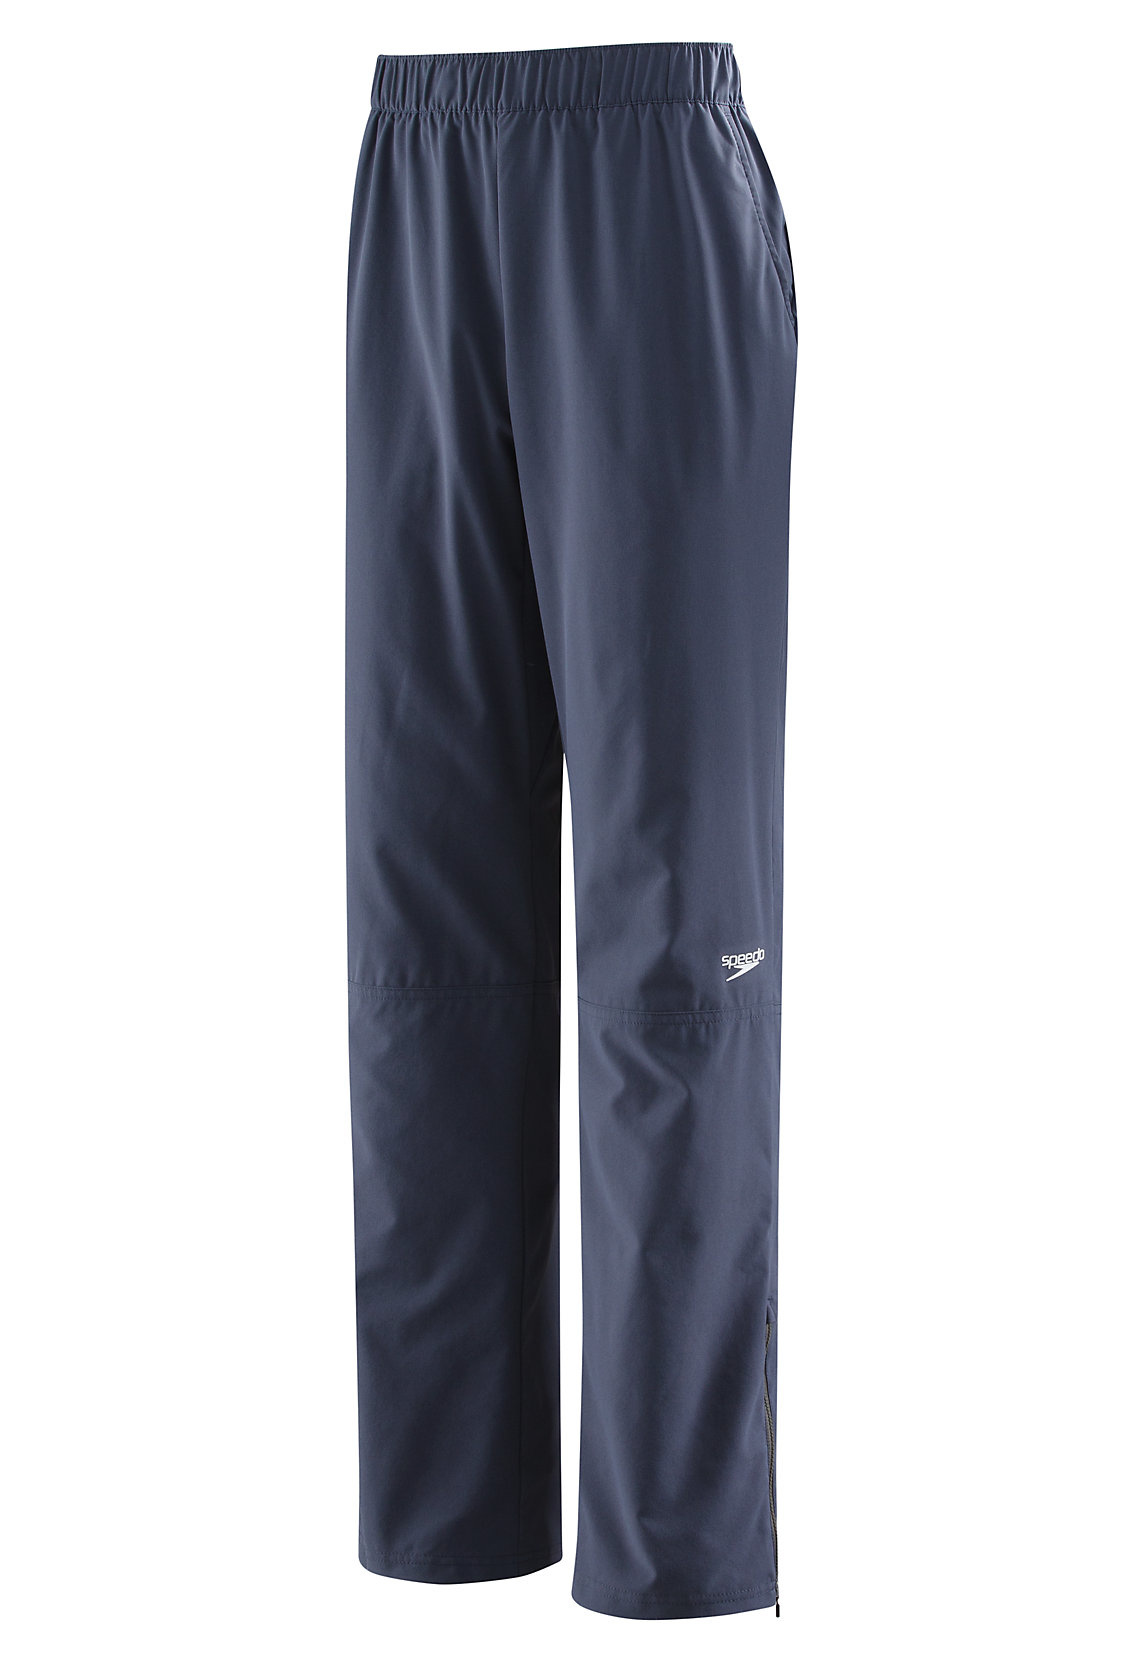 Holmes HS Pants